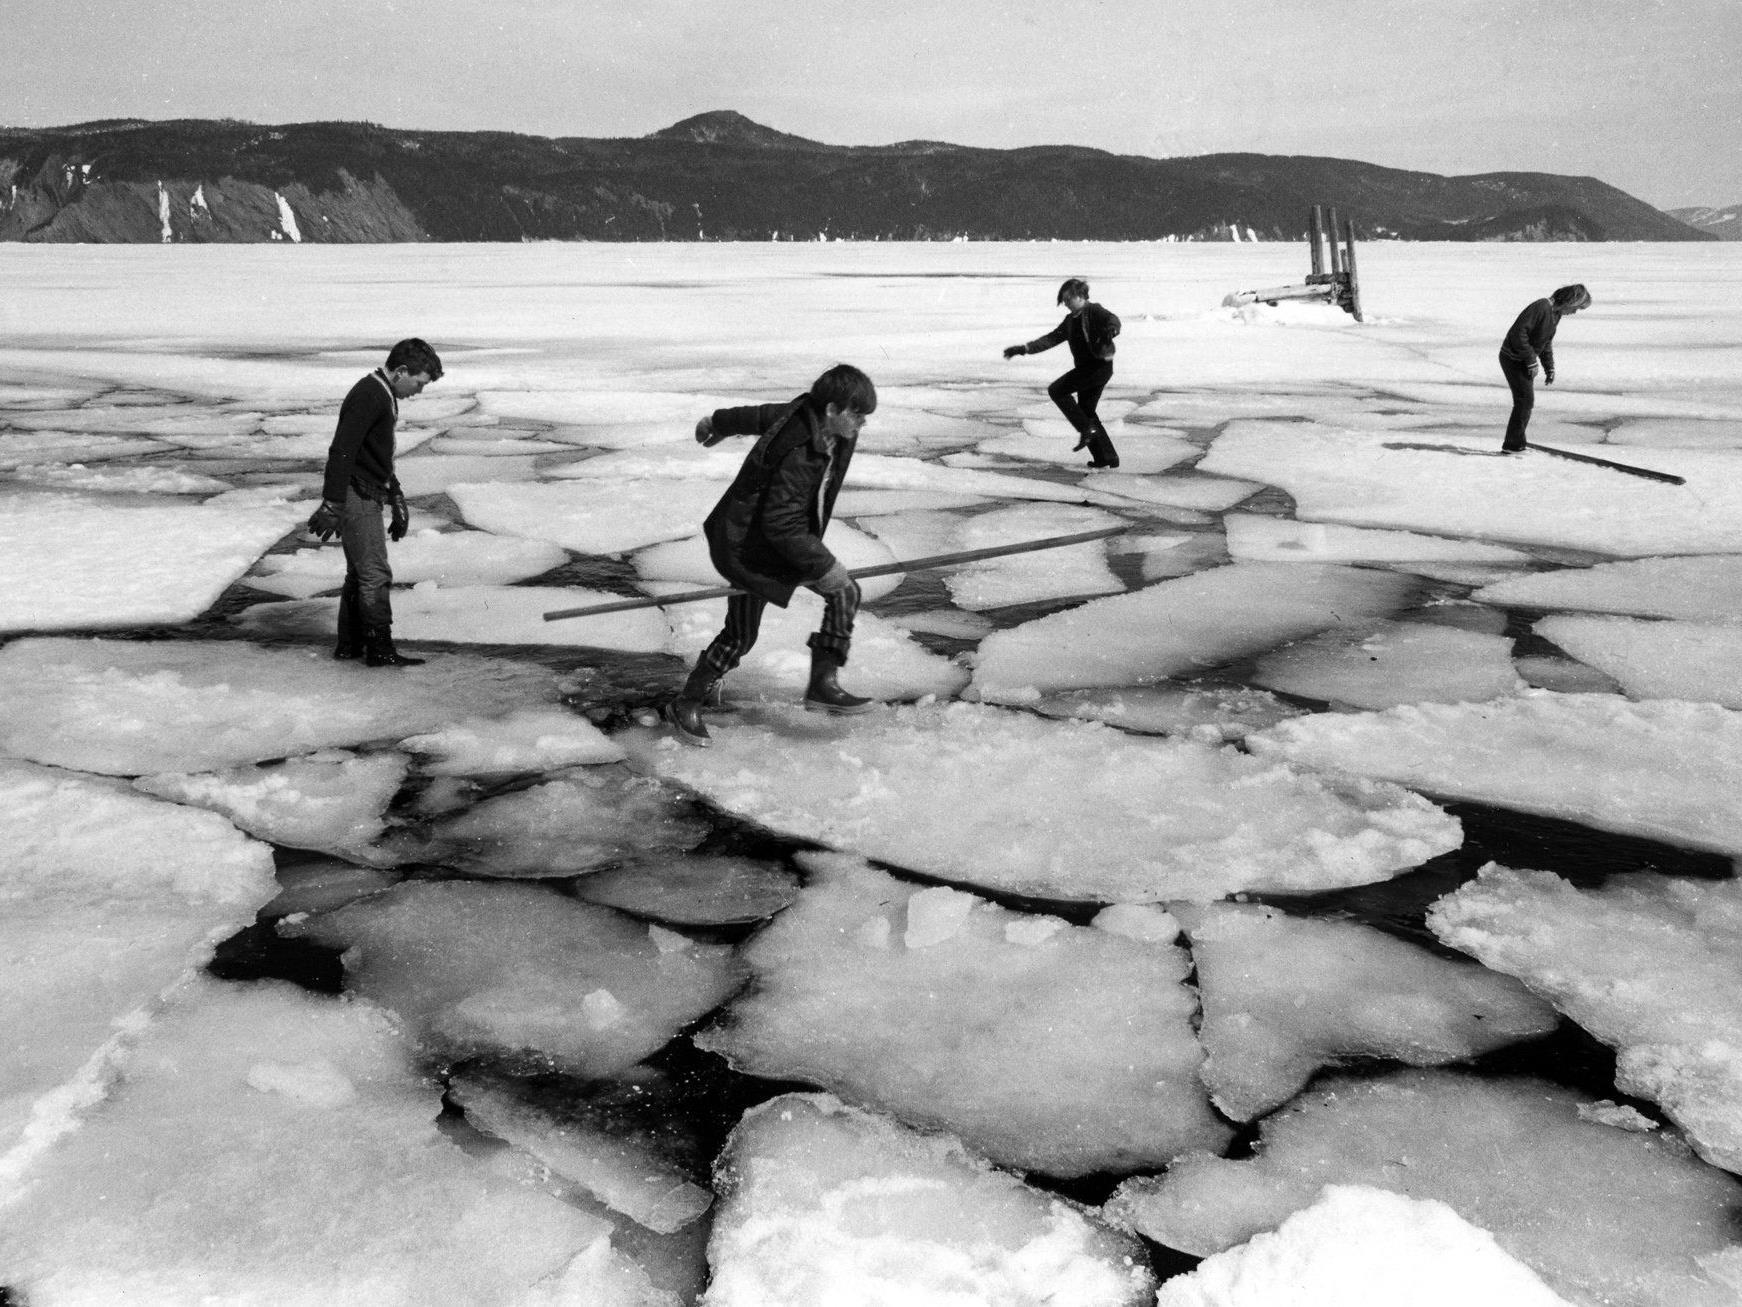 Cox's Cove, Neufundland, 1971